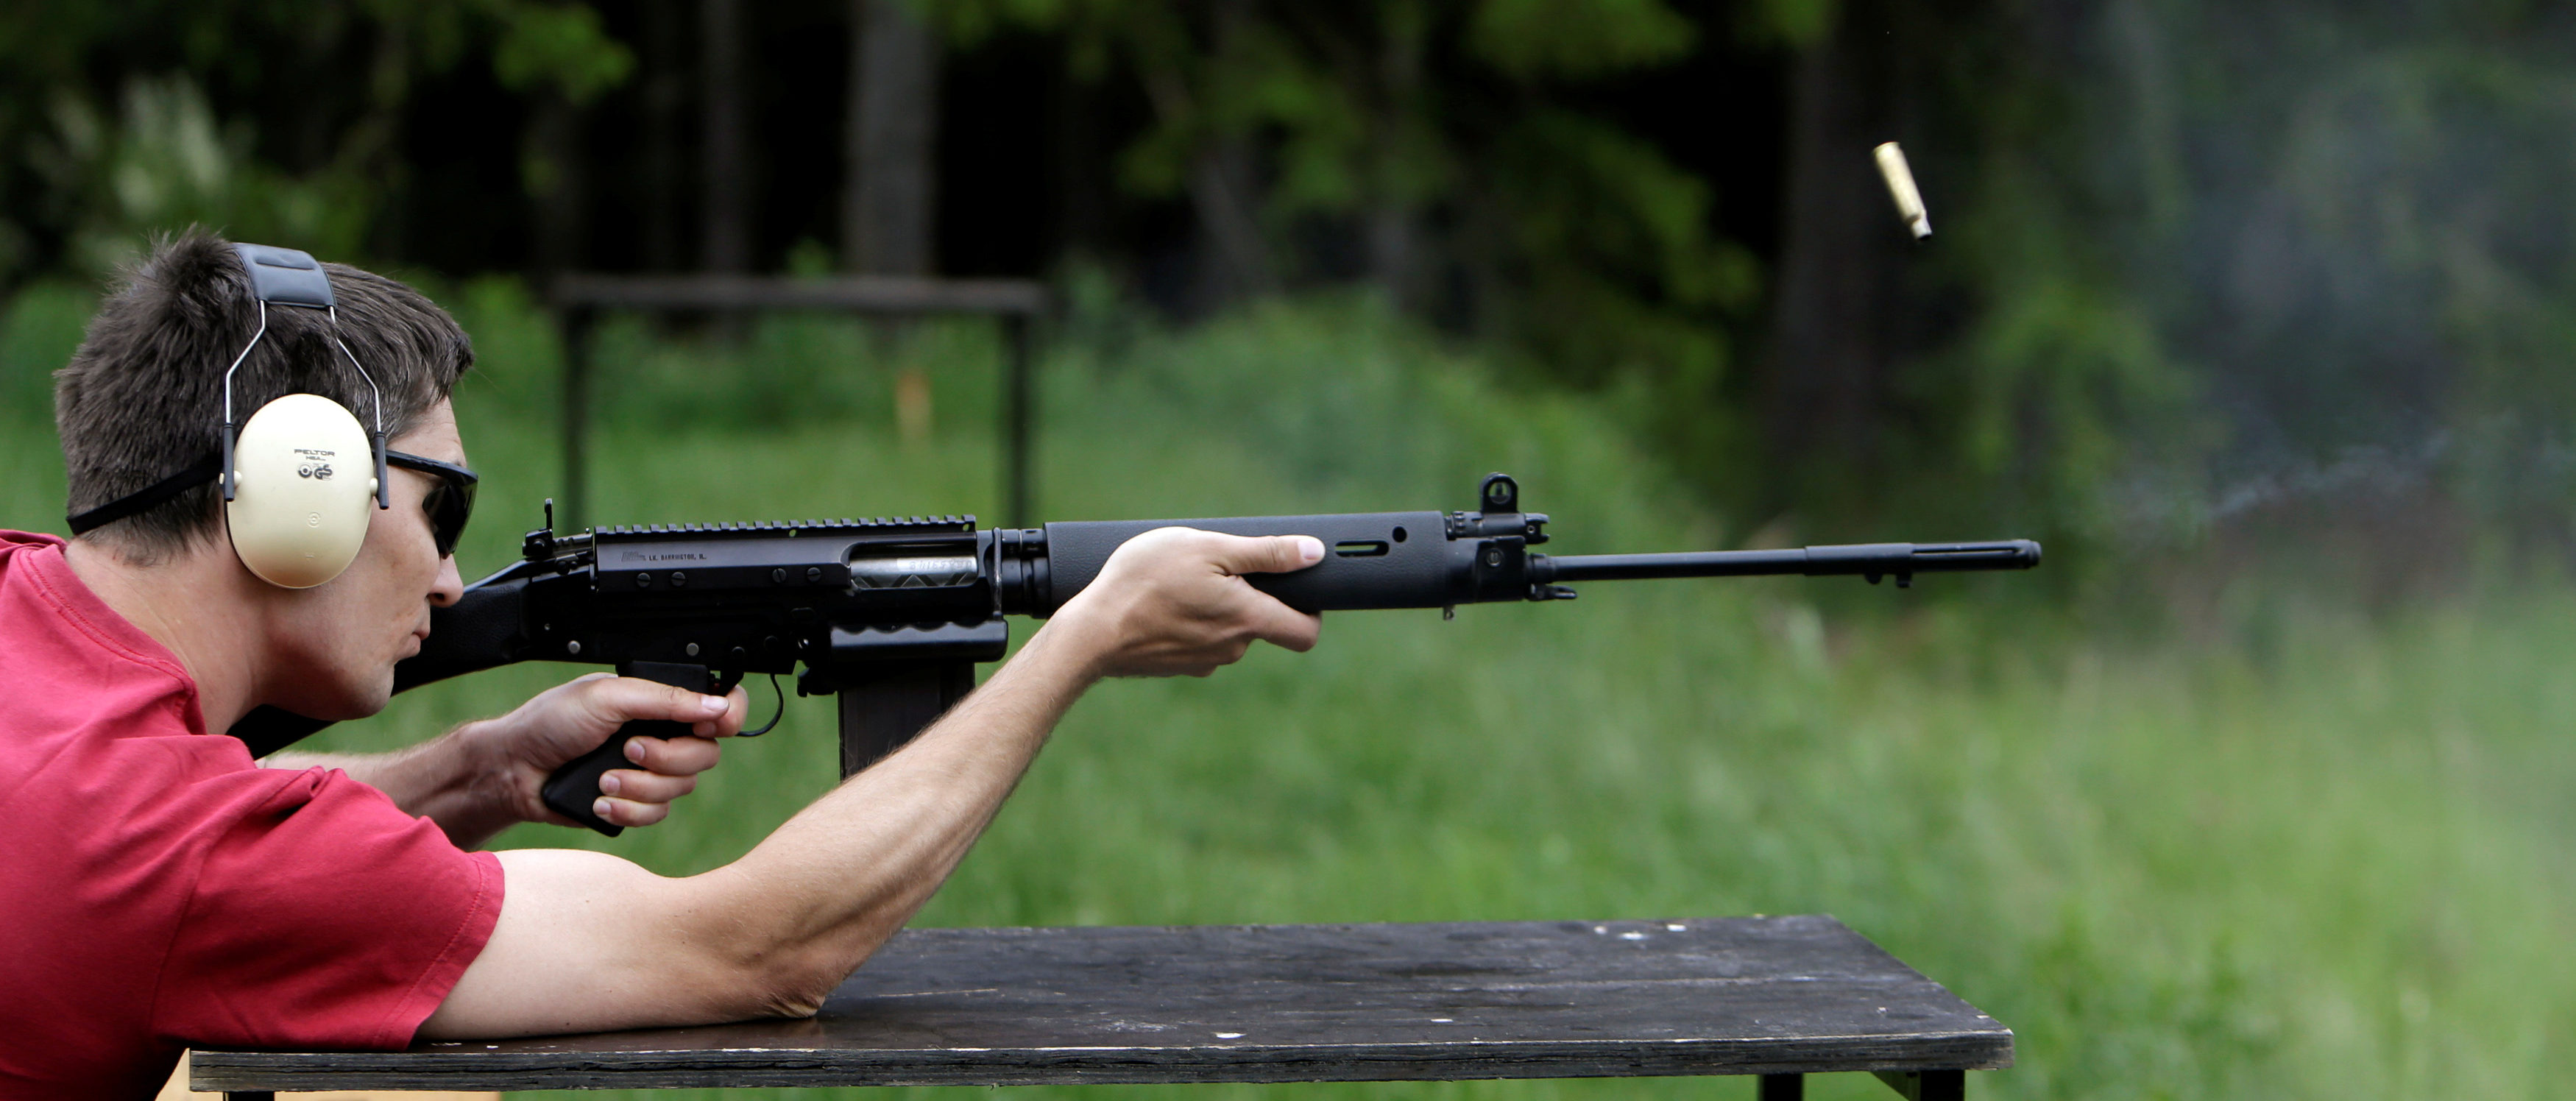 Jan Vurbs shoots his rifle at a forest shooting range near the village of Visnova, Czech Republic, June 9, 2016. REUTERS/David W Cerny